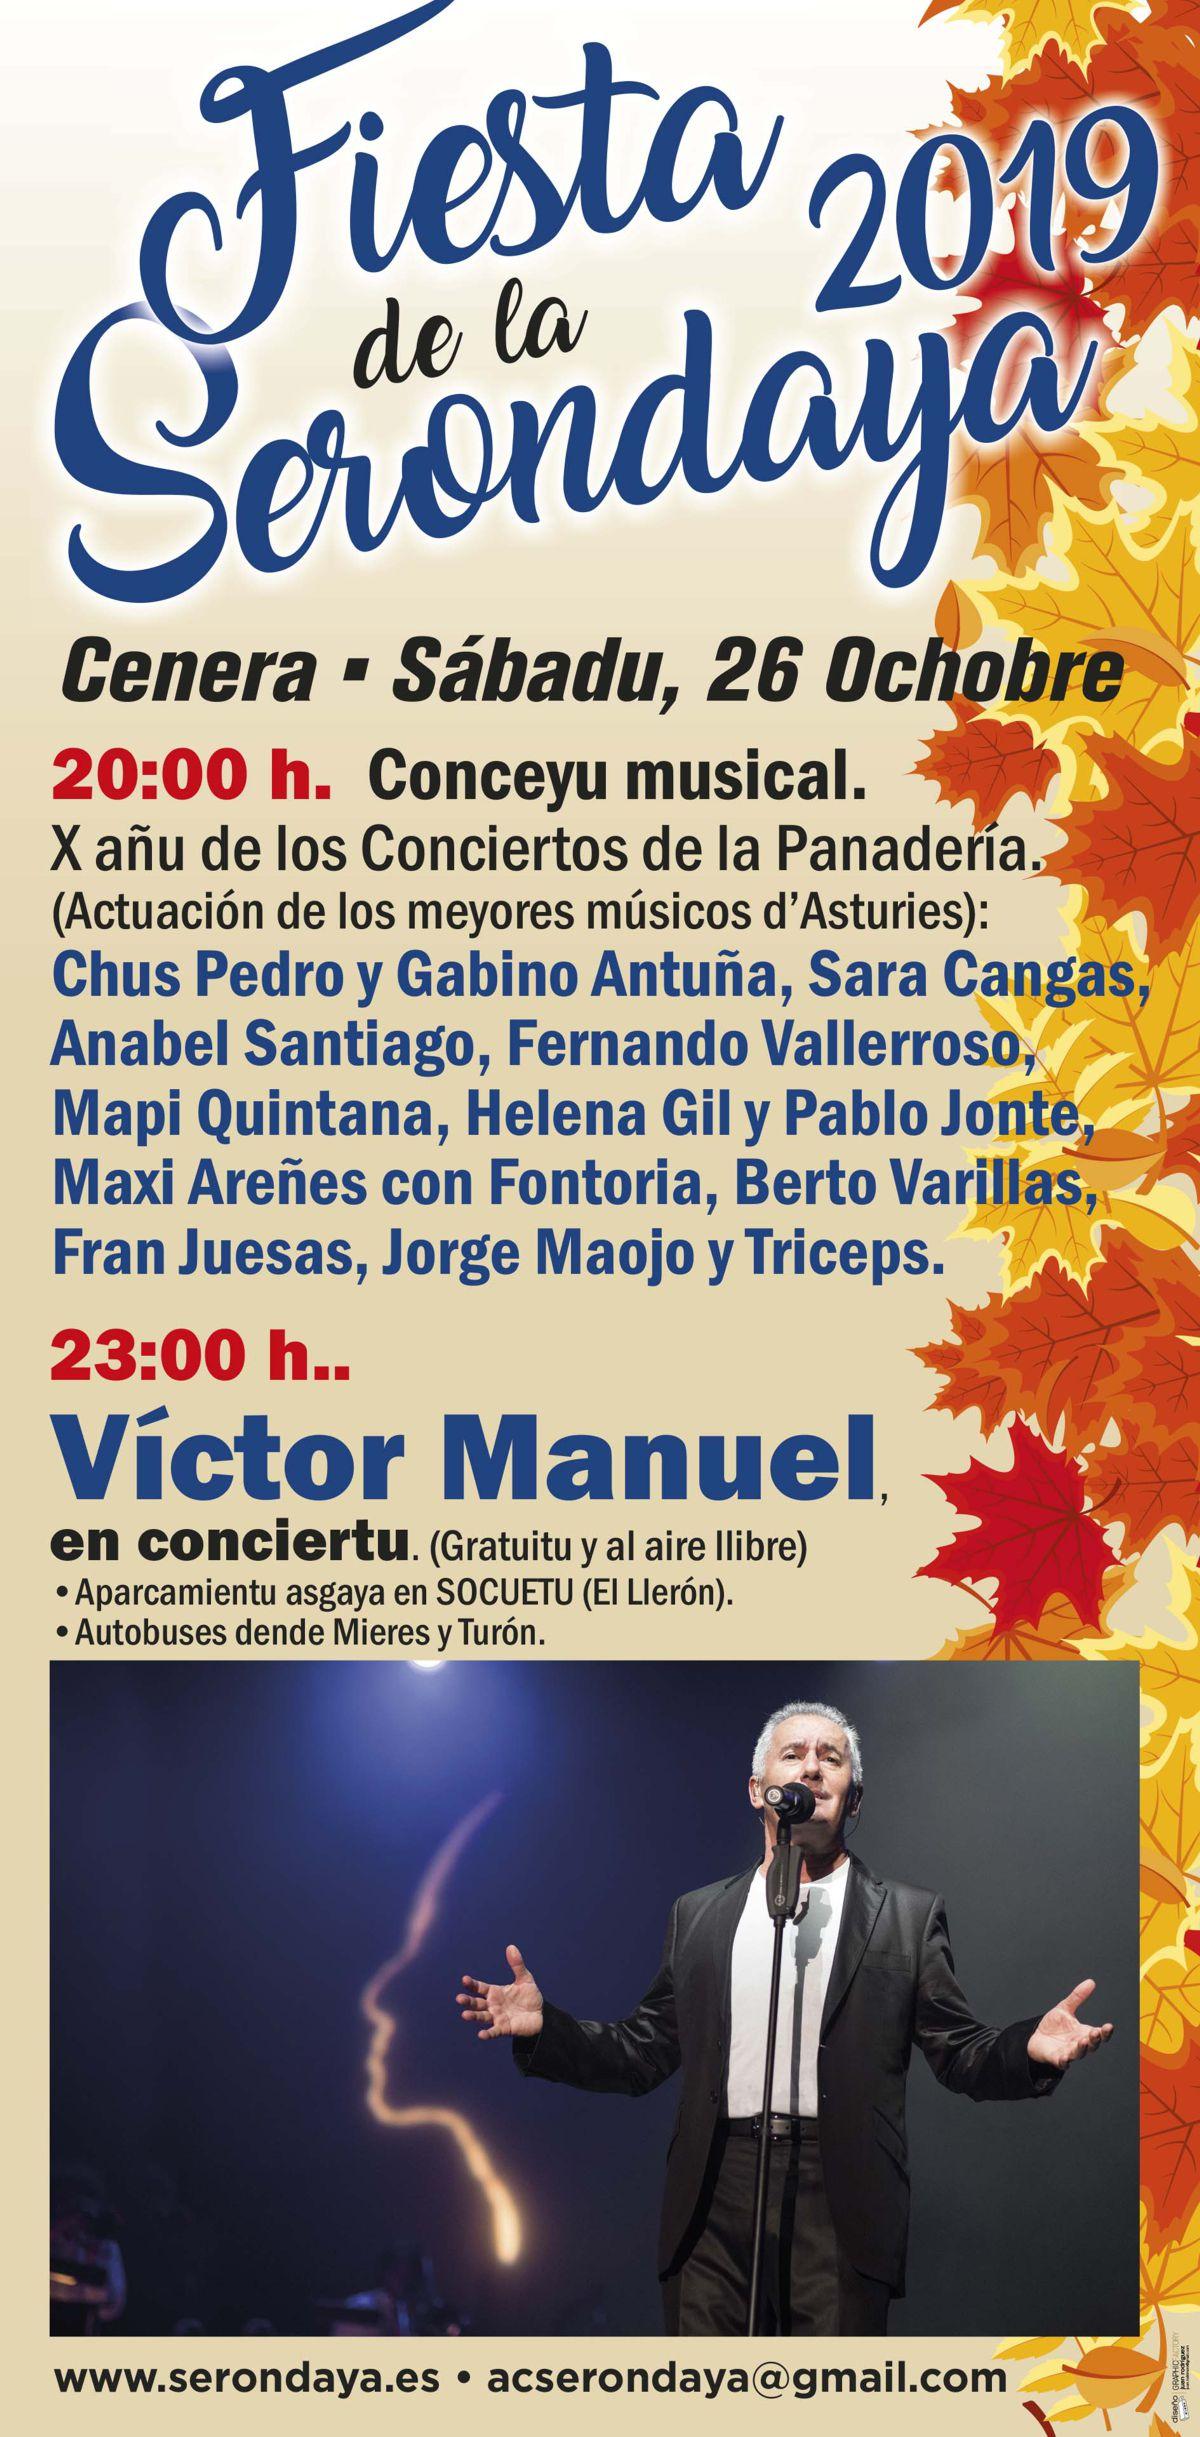 Cartel Web Serondaya Conceyu Musical